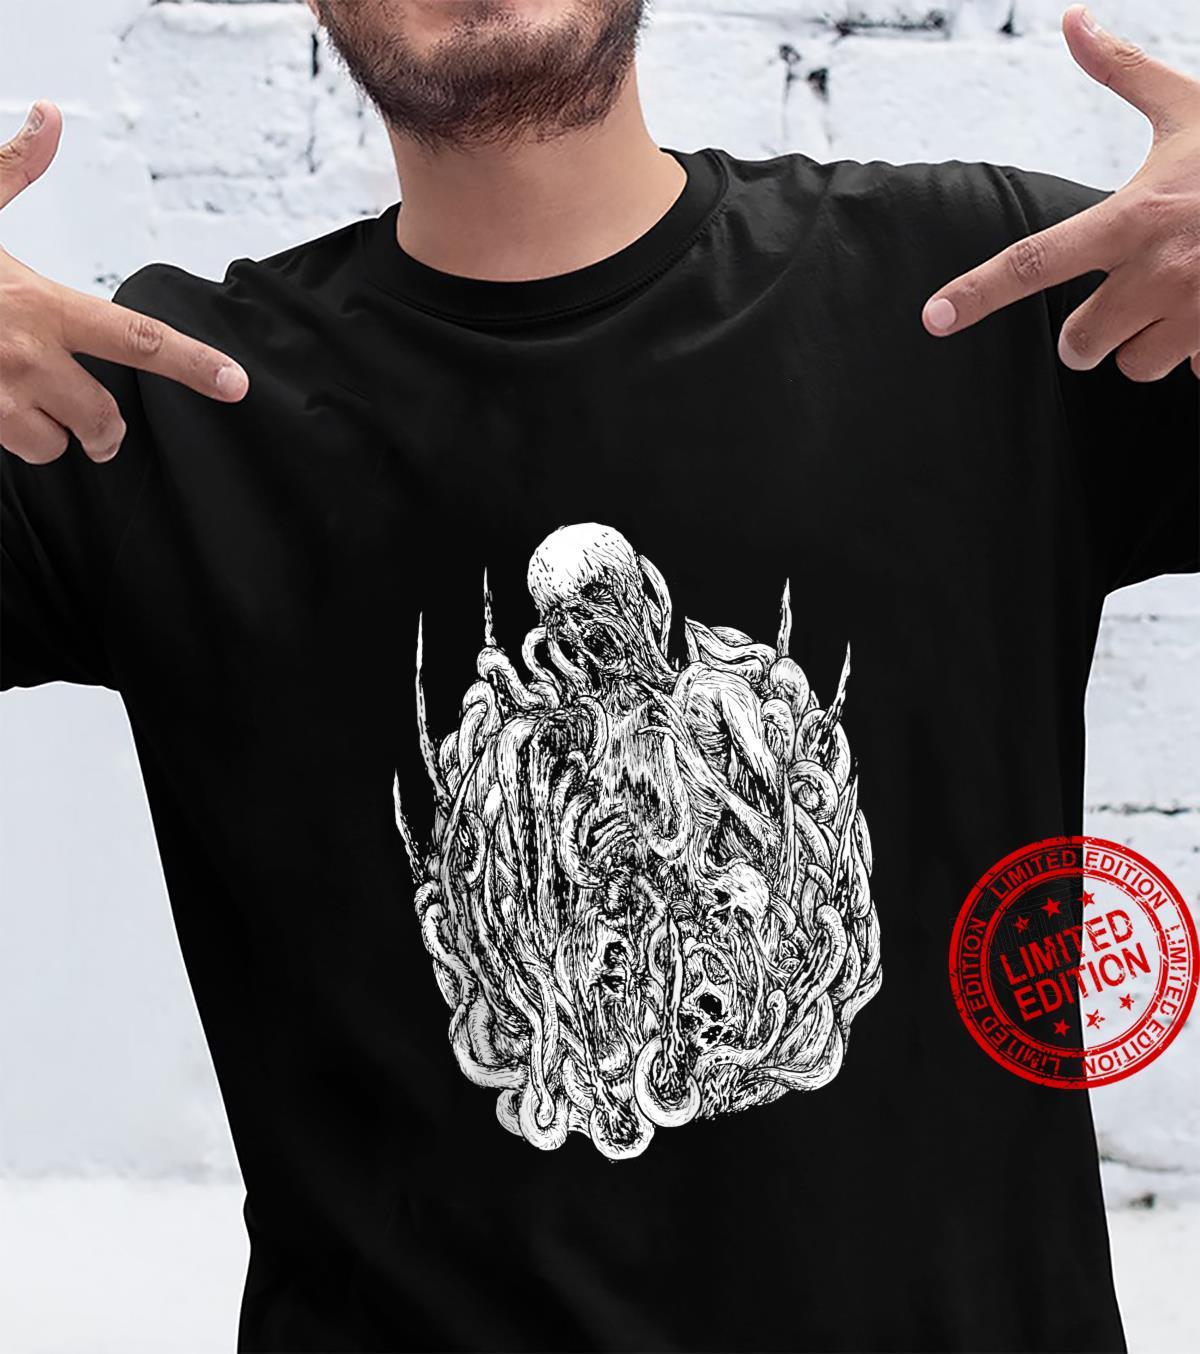 Brutal Skull Satanic Occult Art by KRAFTD Shirt